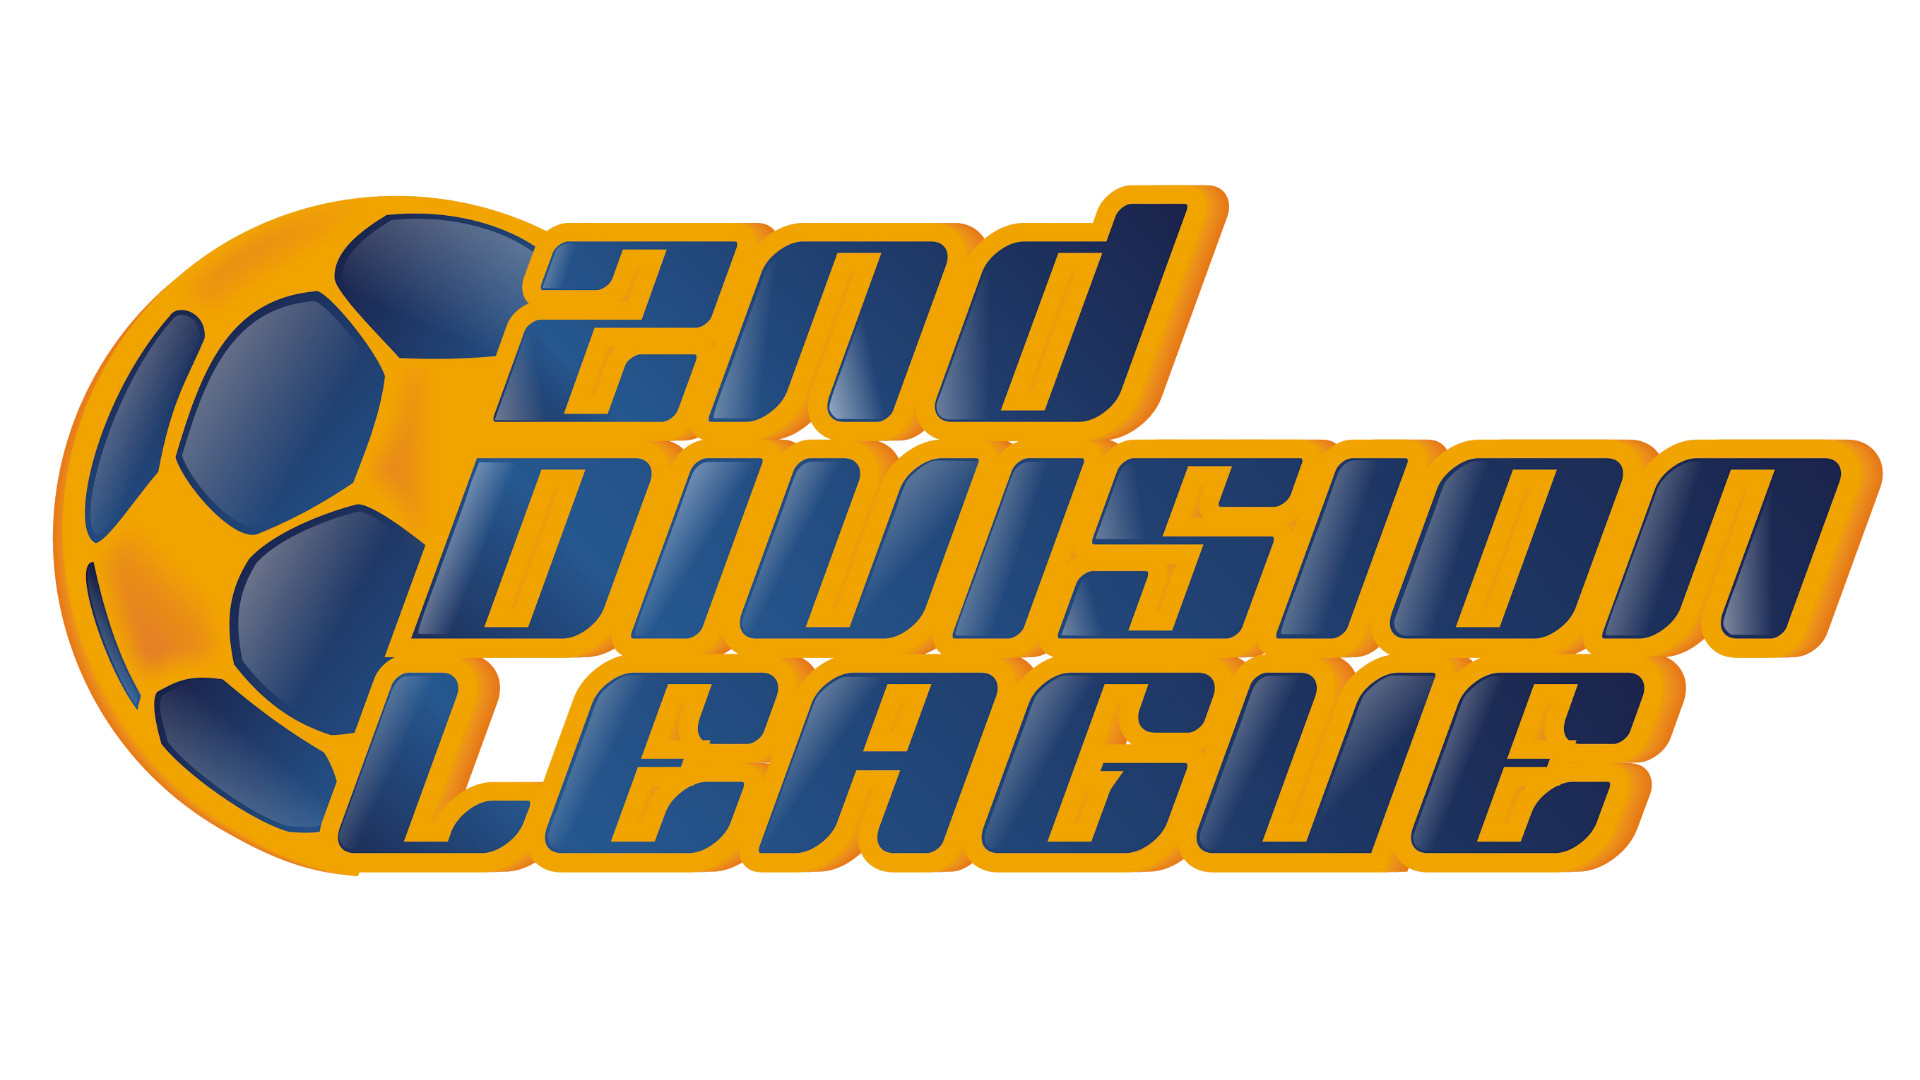 I-League second division logo